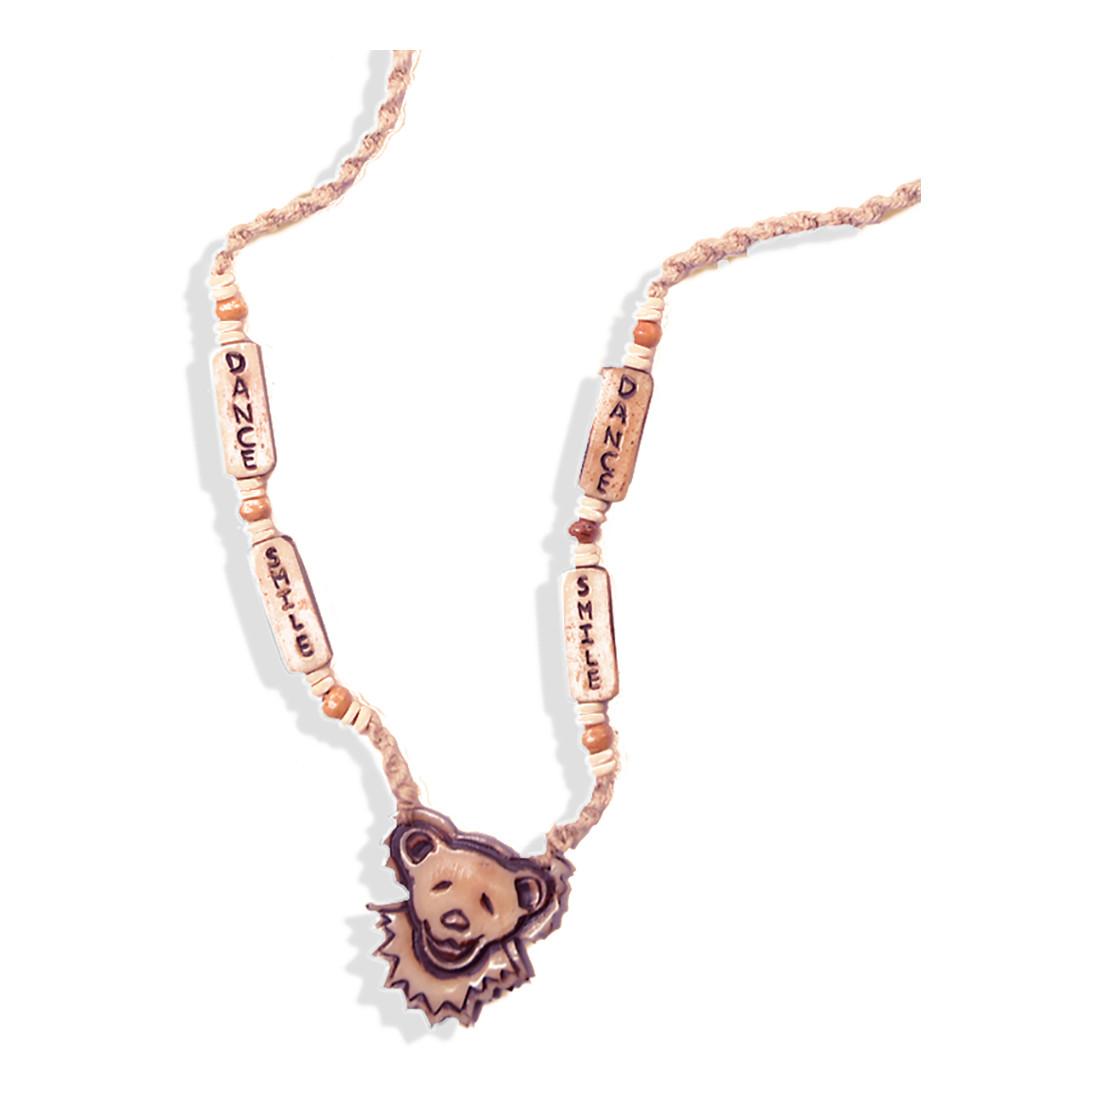 Bear Face and Smile Dance Bone Bead Hemp Necklace